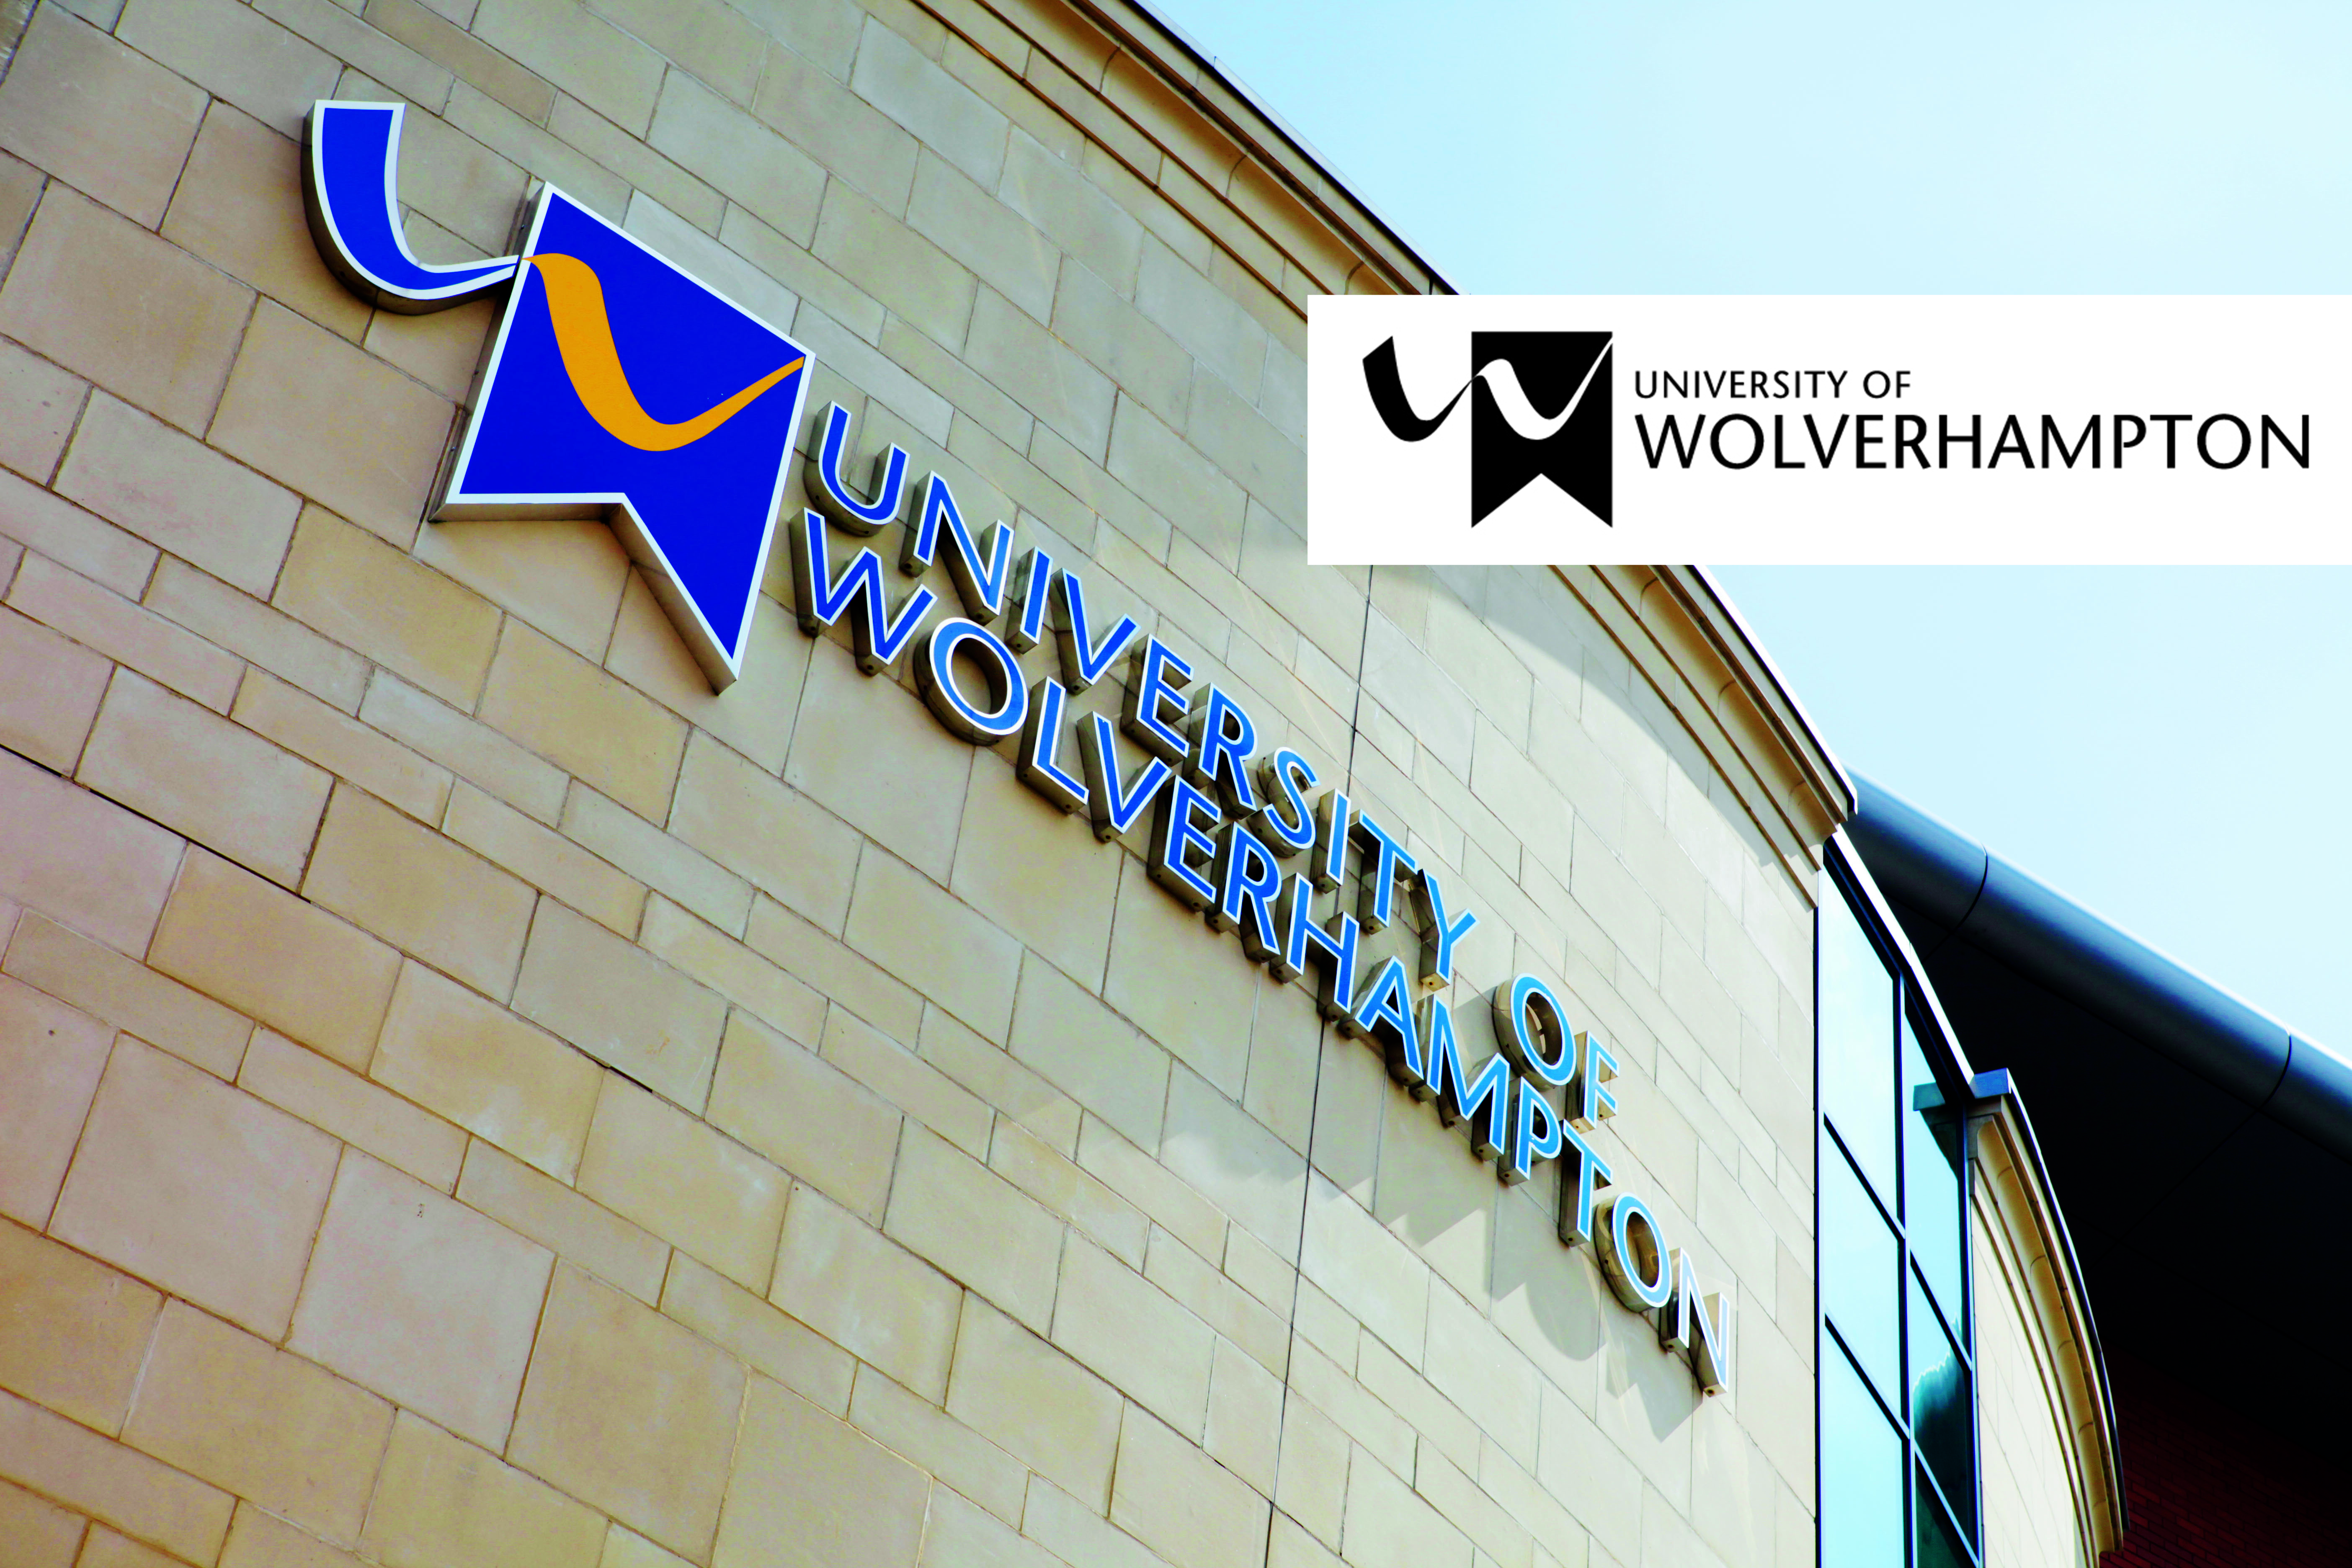 wolver-logo